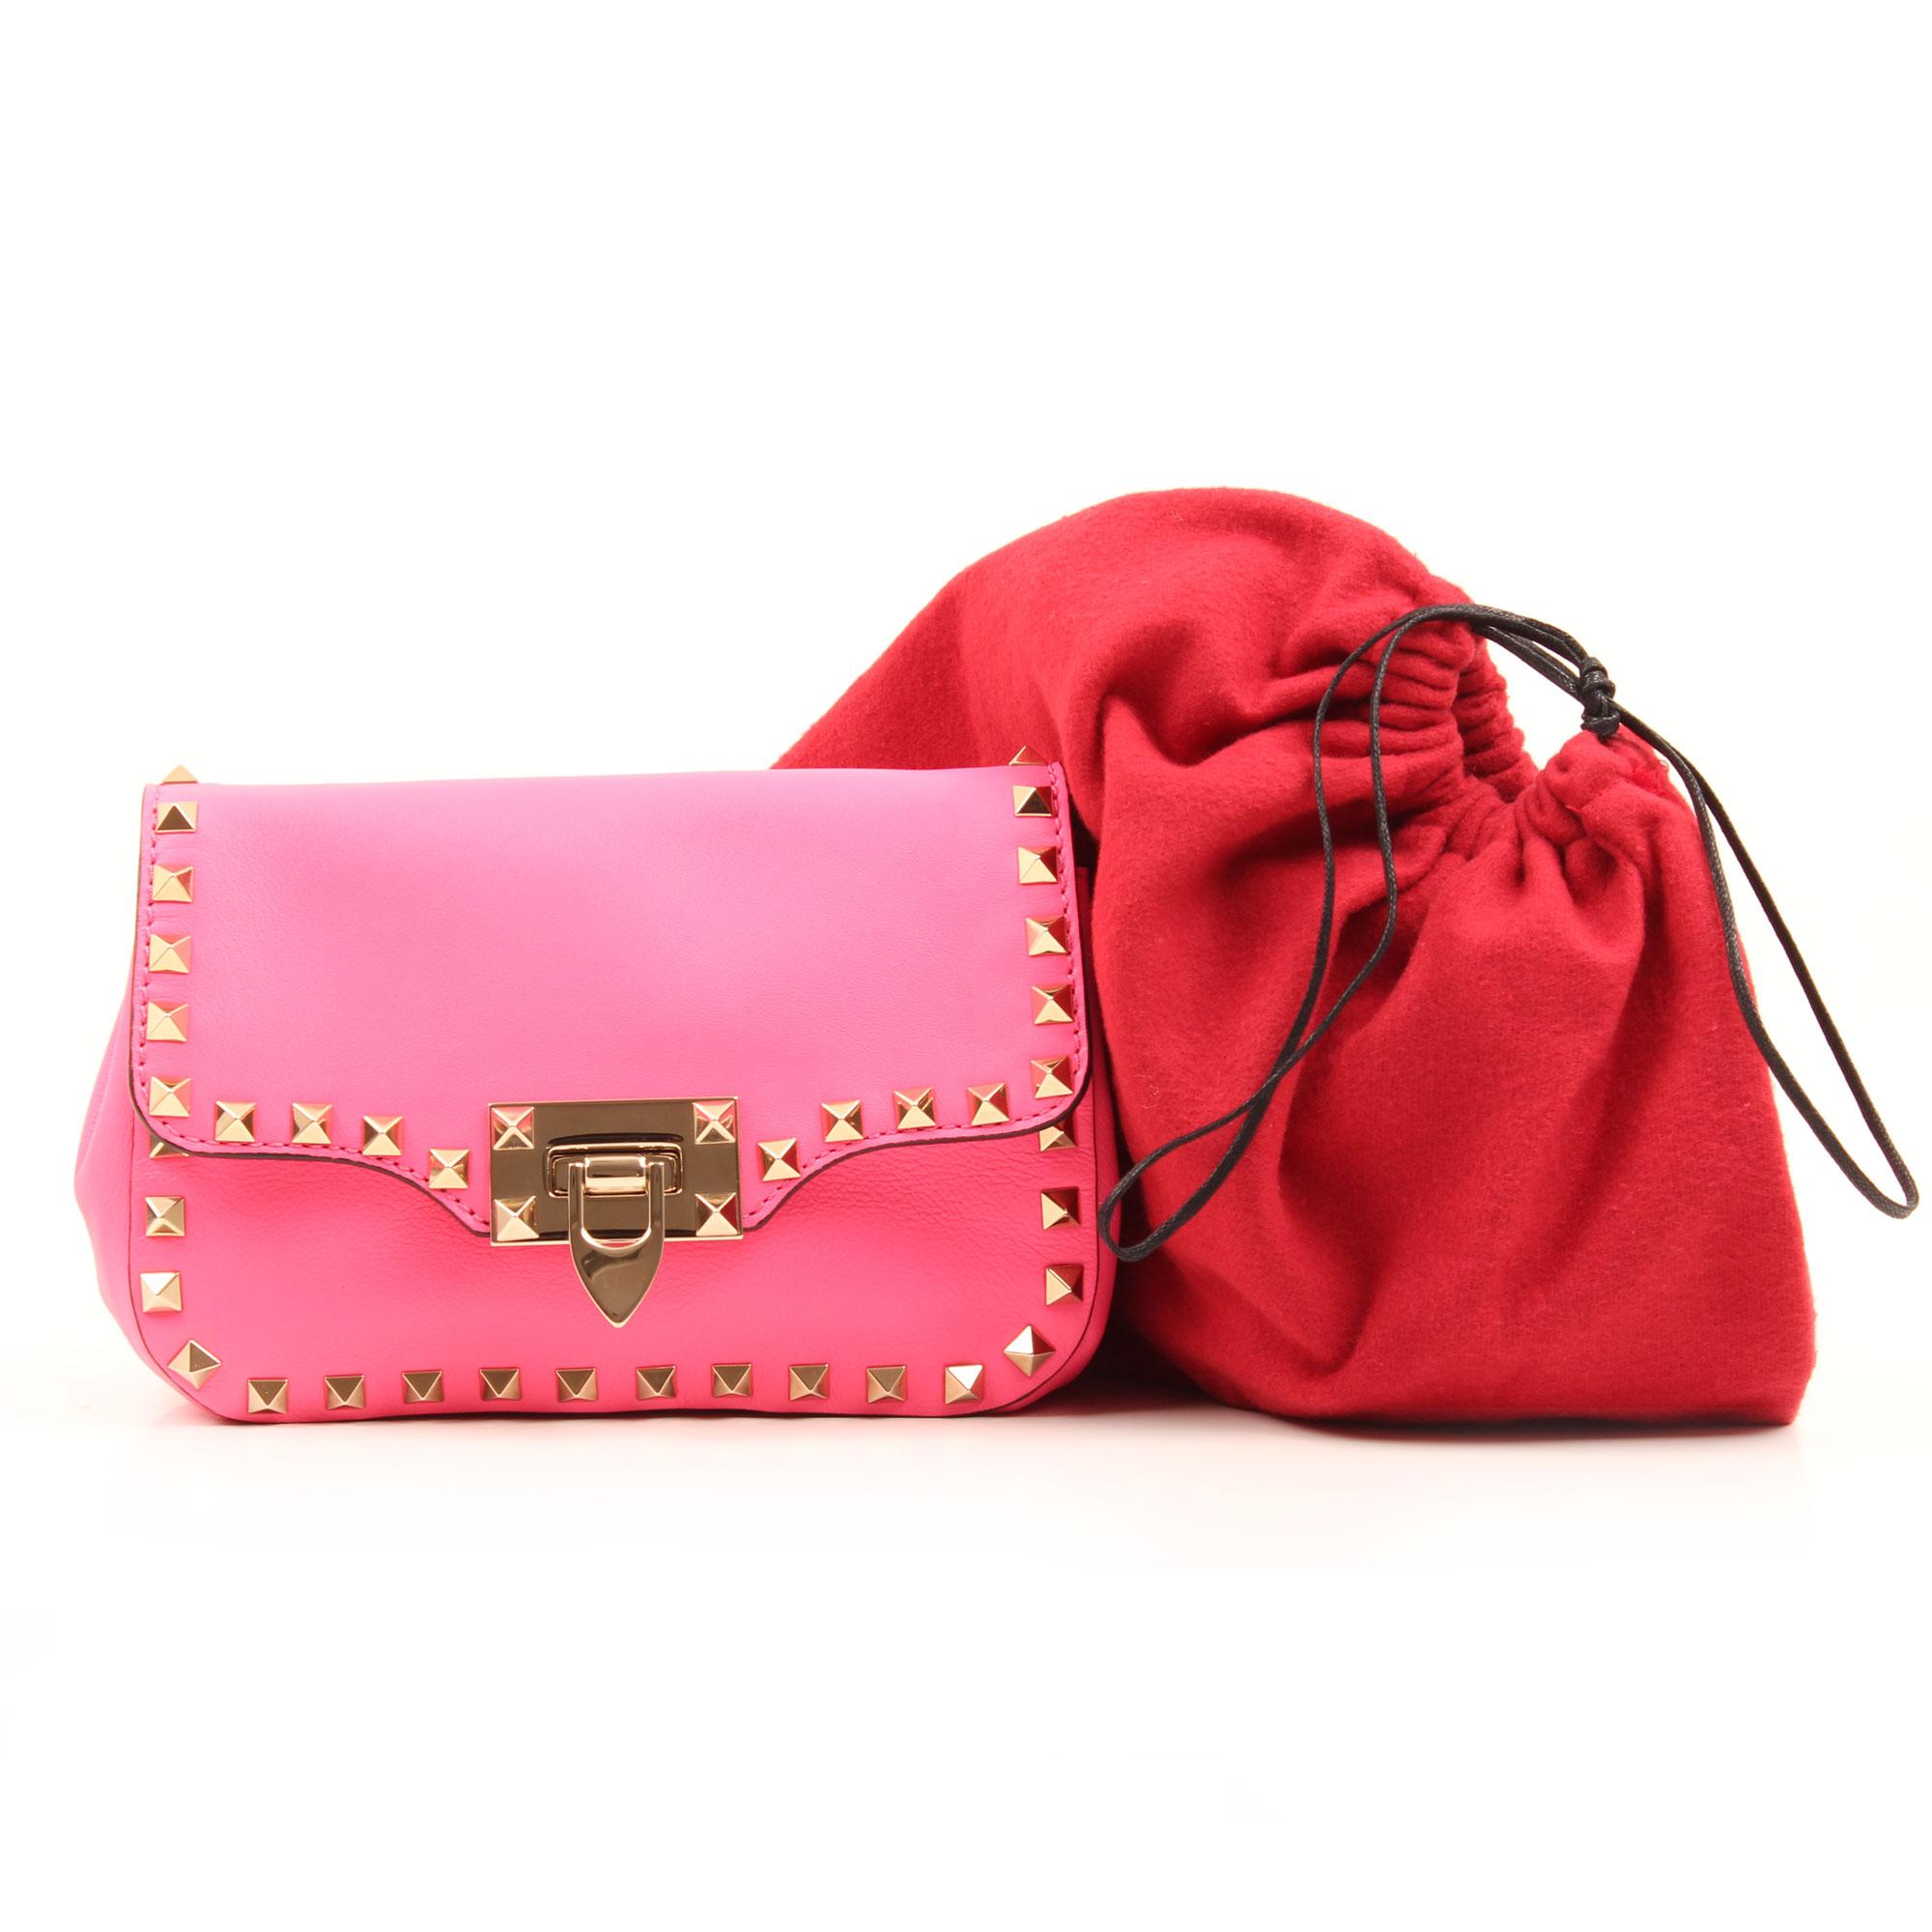 Dustbag image of valentino mini rockstud pink bag